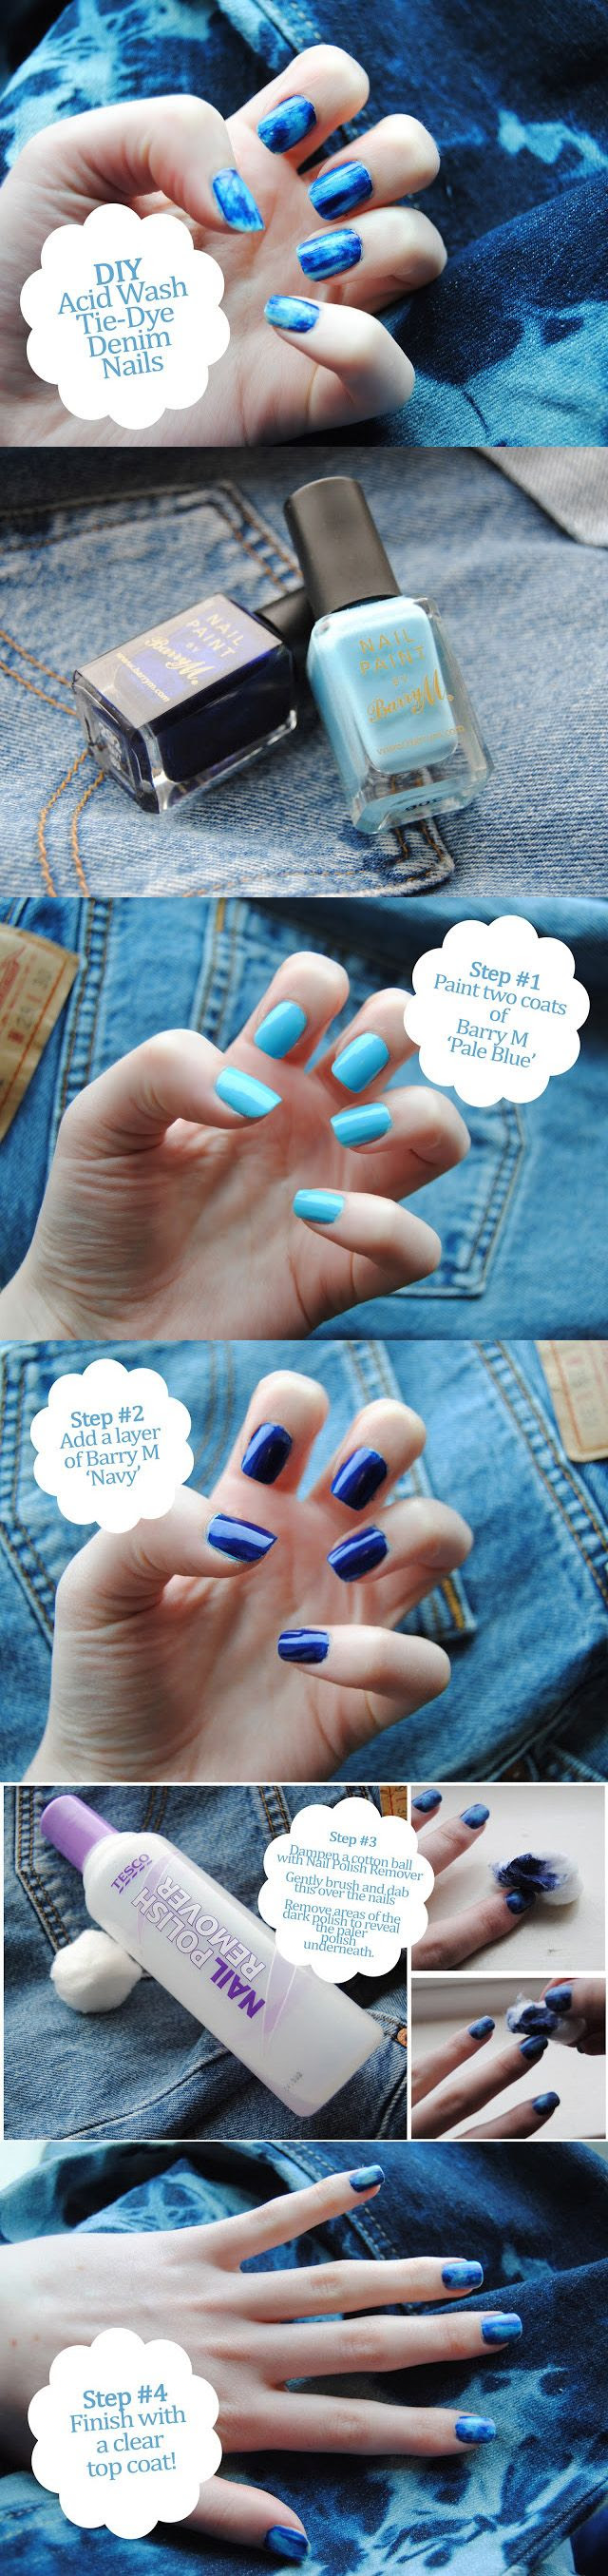 10 Amazing Nails Tutorials - Fashion Diva Design  | See more nail designs at http://www.nailsss.com/nail-styles-2014/2/